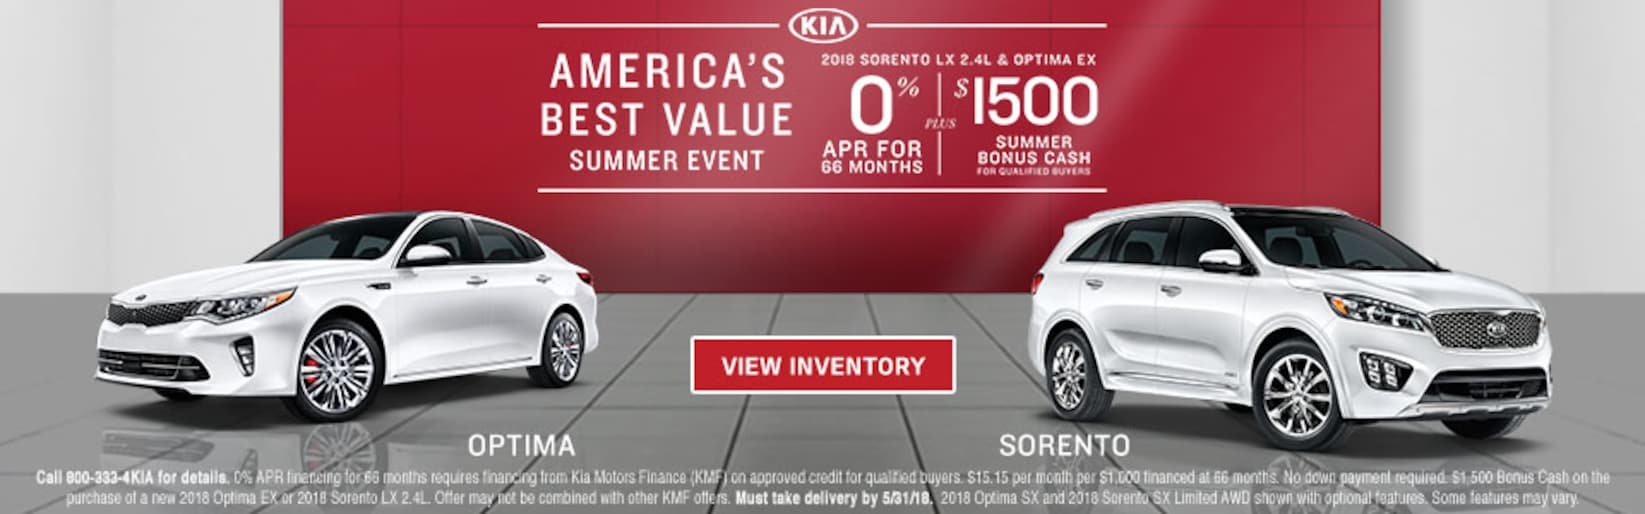 New 2018-2019 & Used Kia Dealership in Johnstown, PA